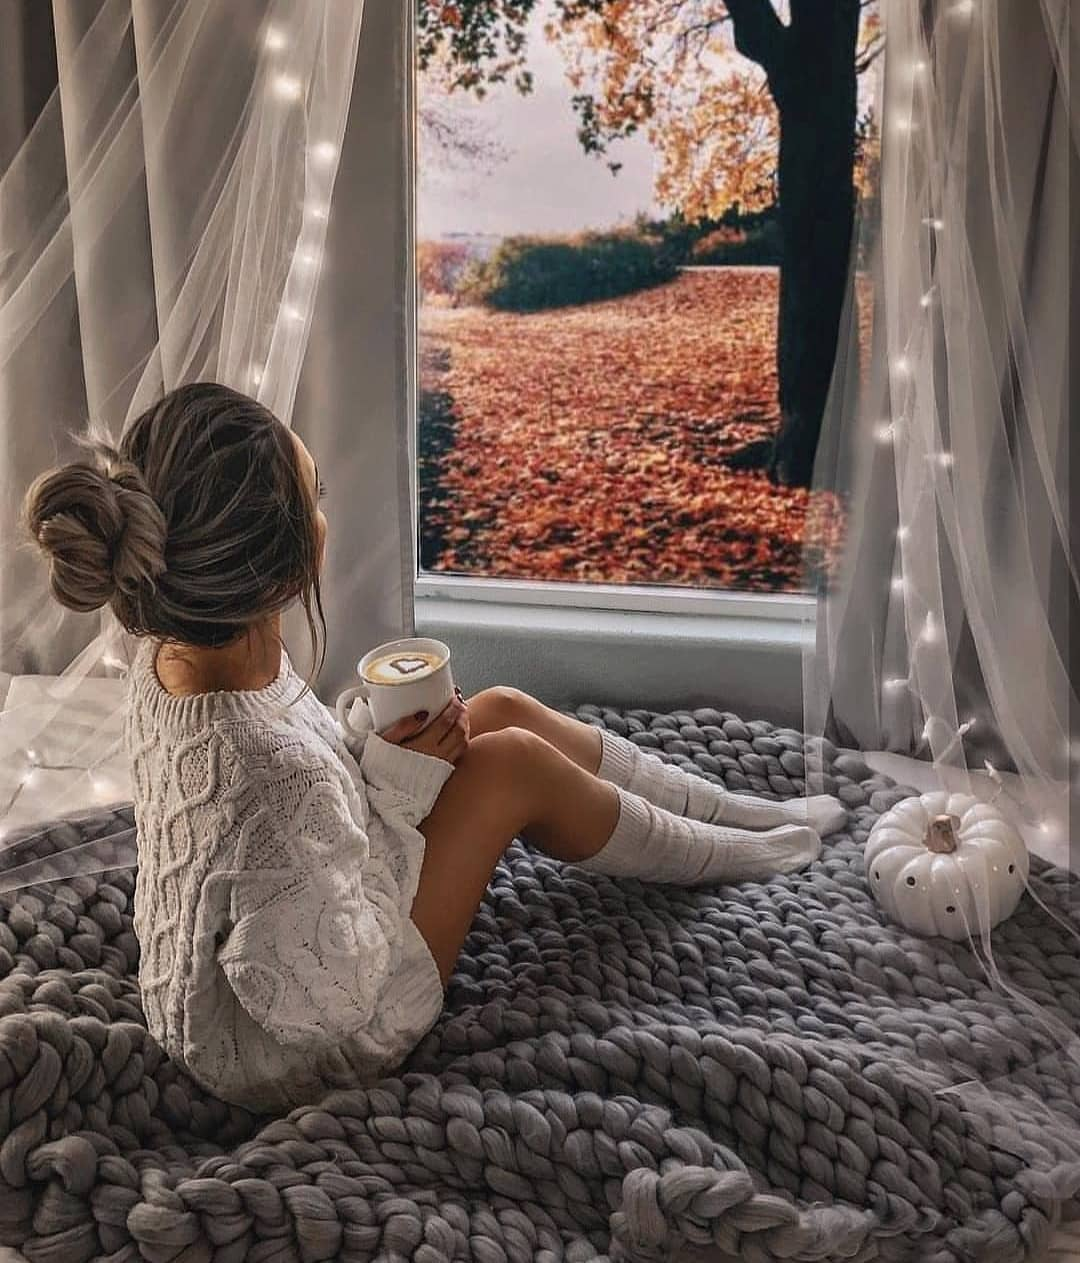 Homewear Essentials For Fall: Sweater Dress And Matching High Socks 2020